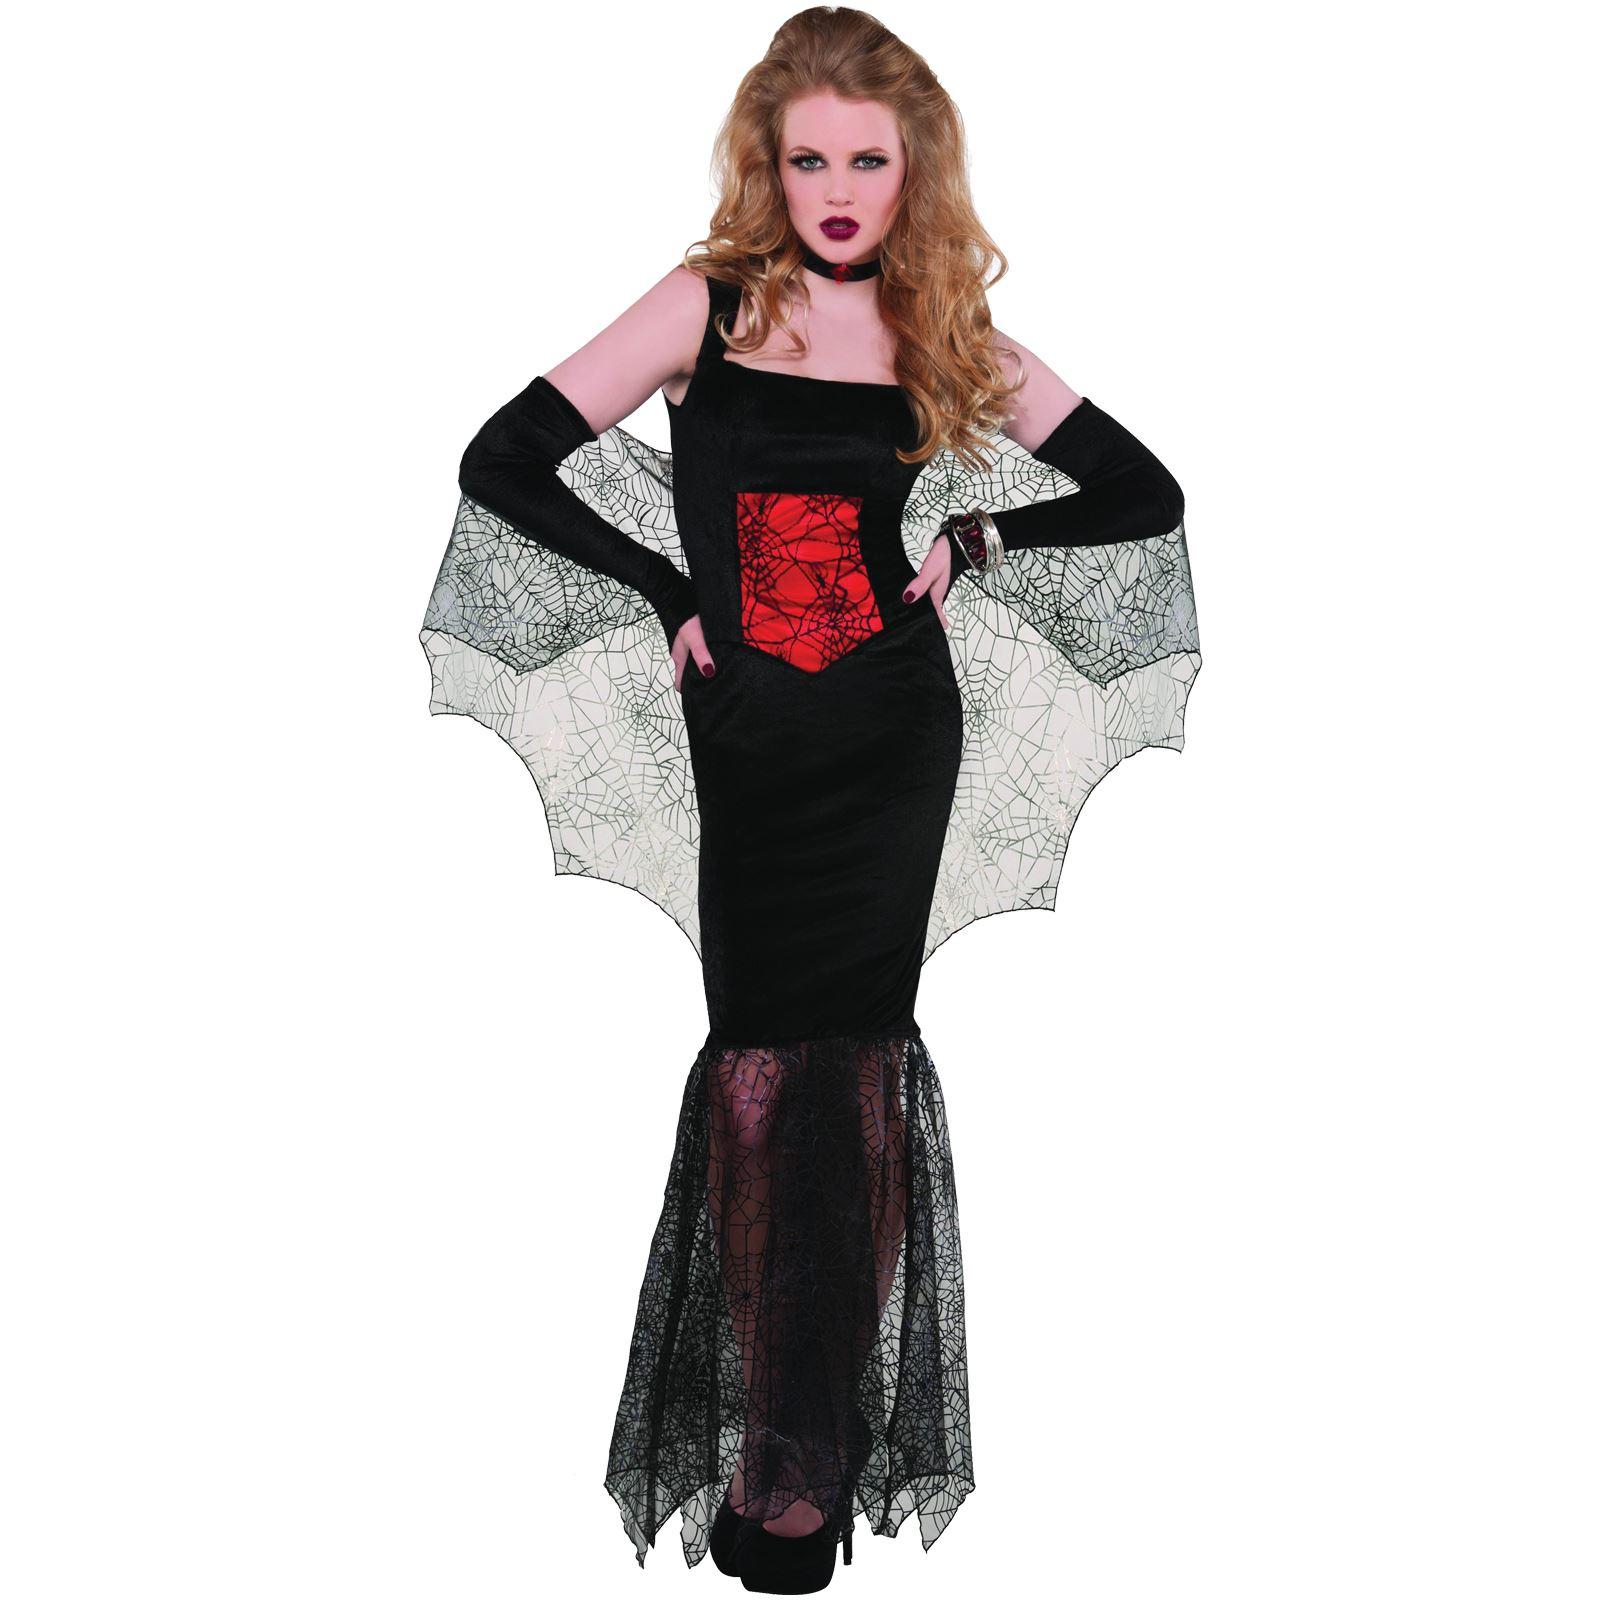 Dracula Vampiro orrore party maschera Halloween fantasia Abito Outfit Accessorio